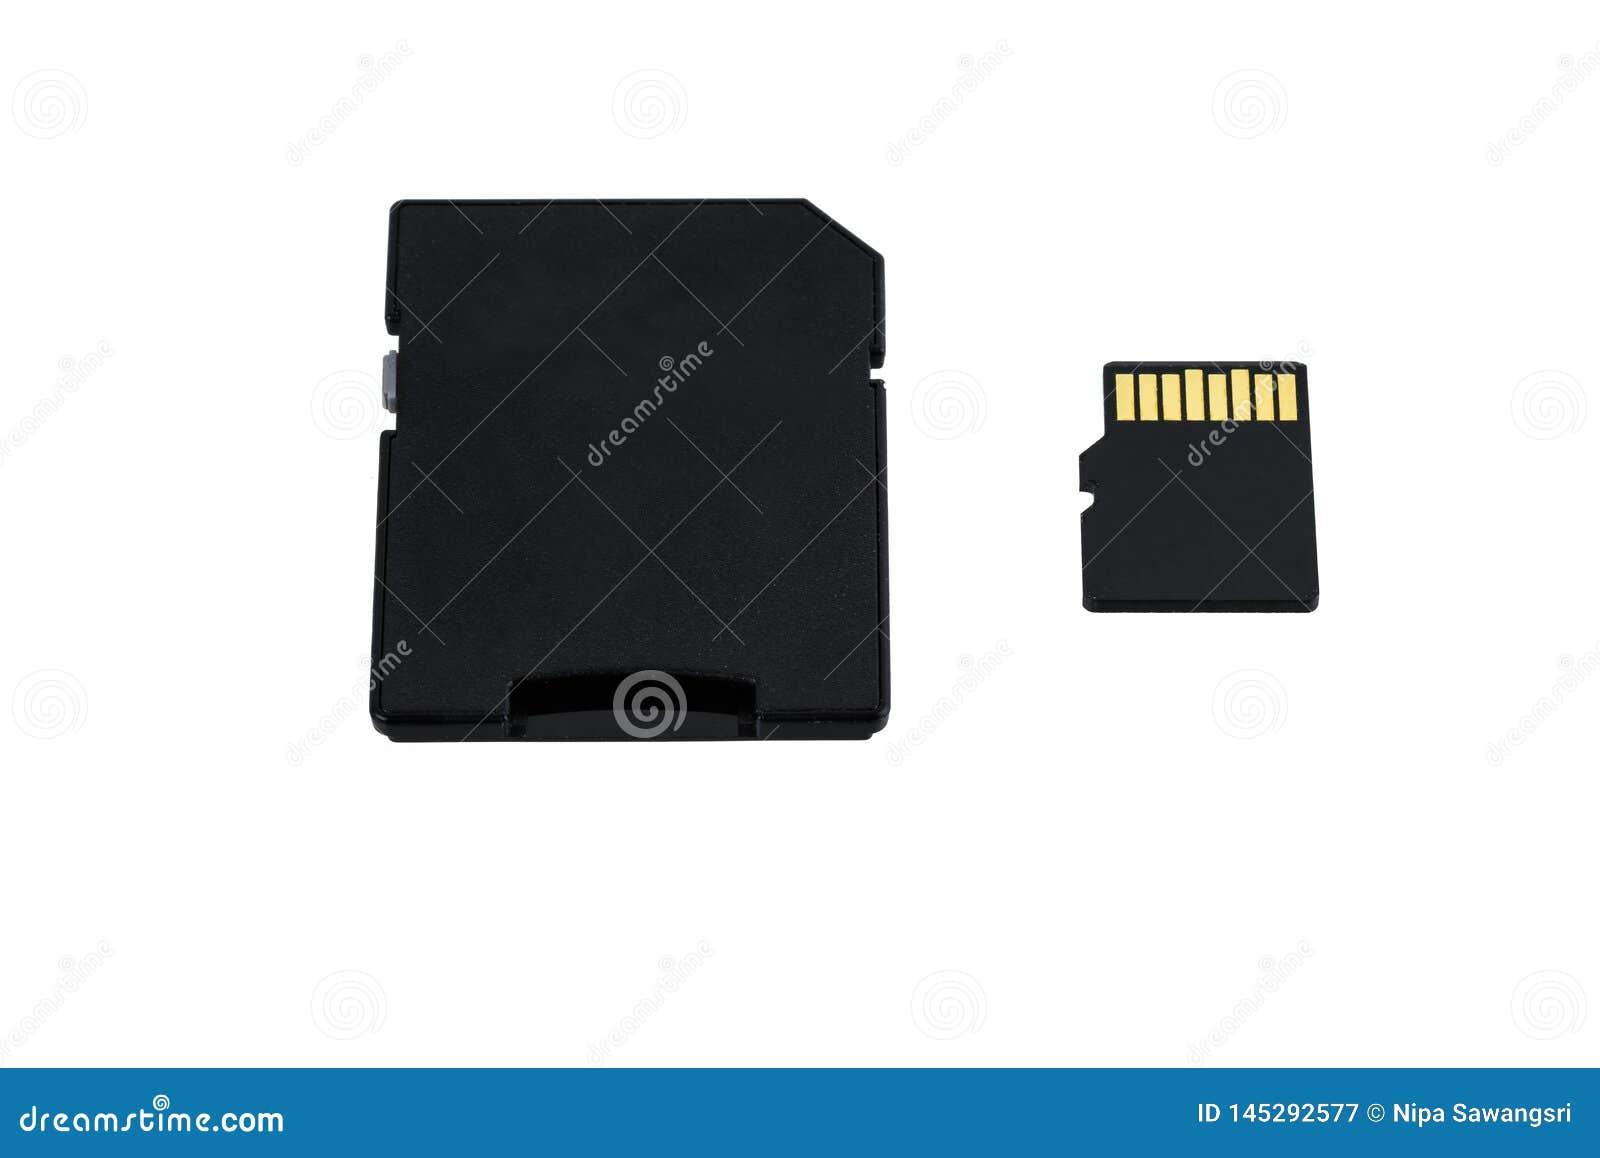 Adapter en MicroSD-Kaart op witte achtergrond wordt geïsoleerd die